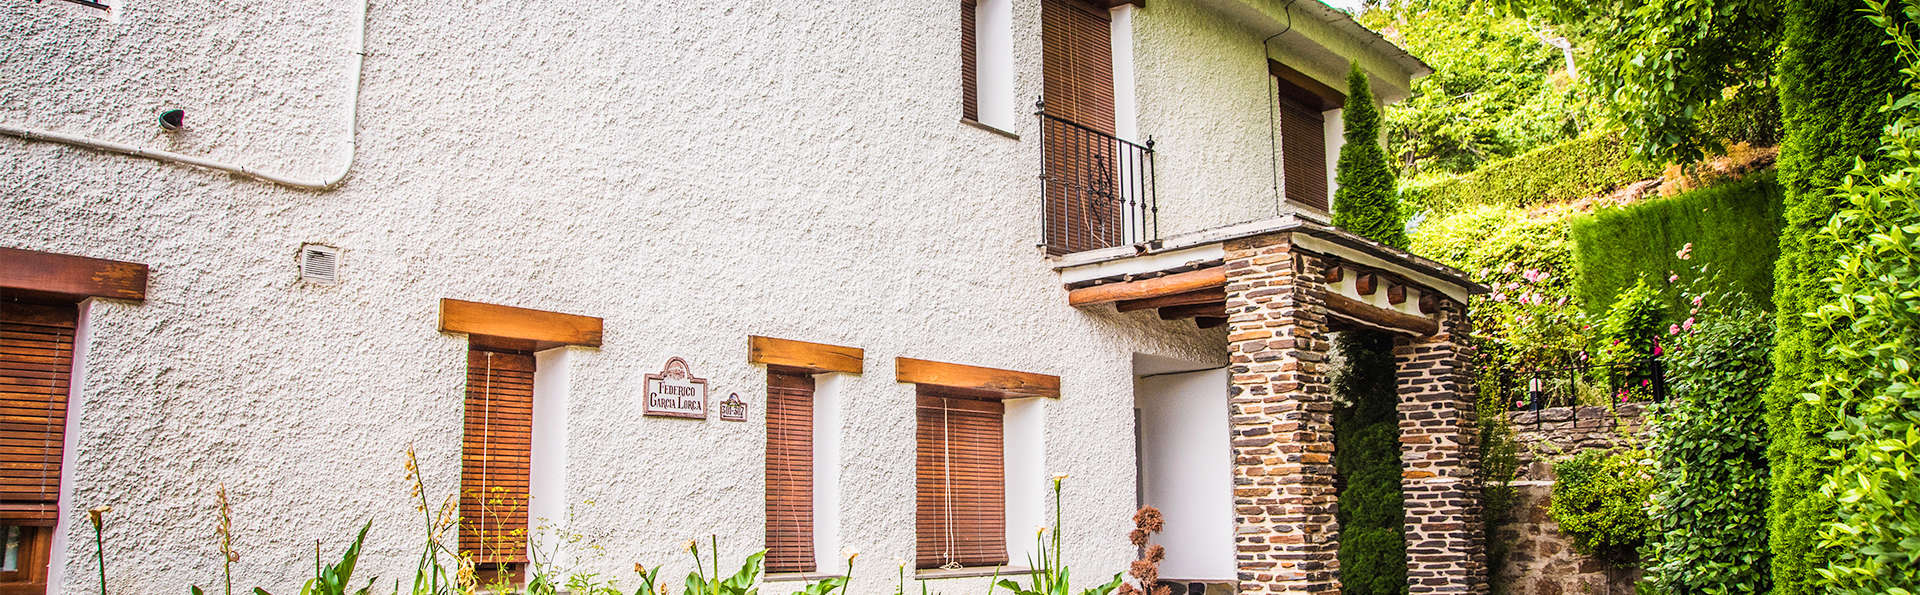 Hotel Rural Finca Los Llanos - EDIT_6_EXT.jpg